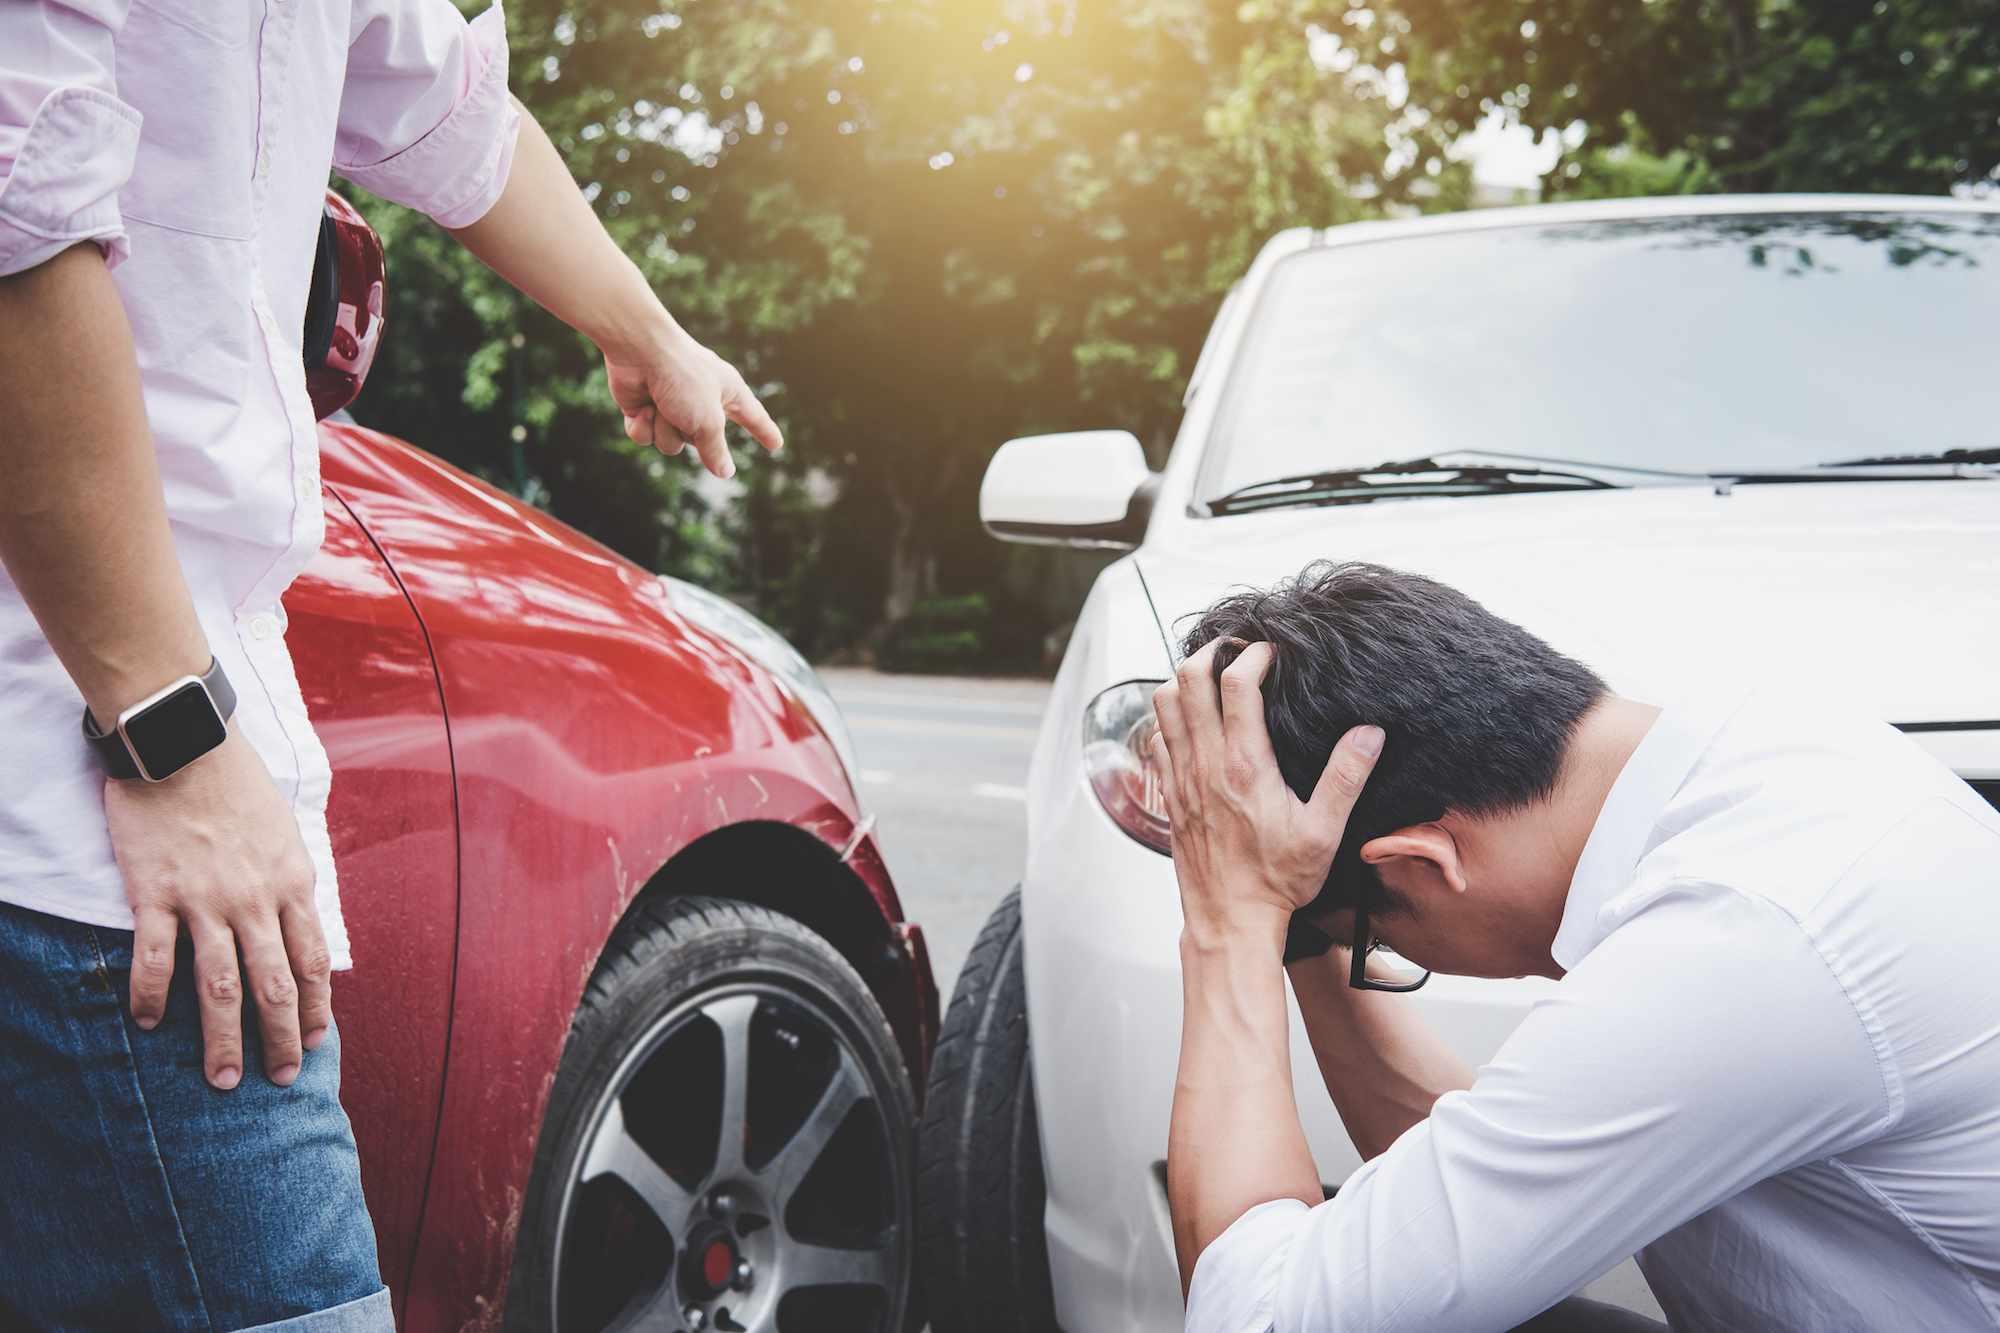 Two men dealing with a car crash